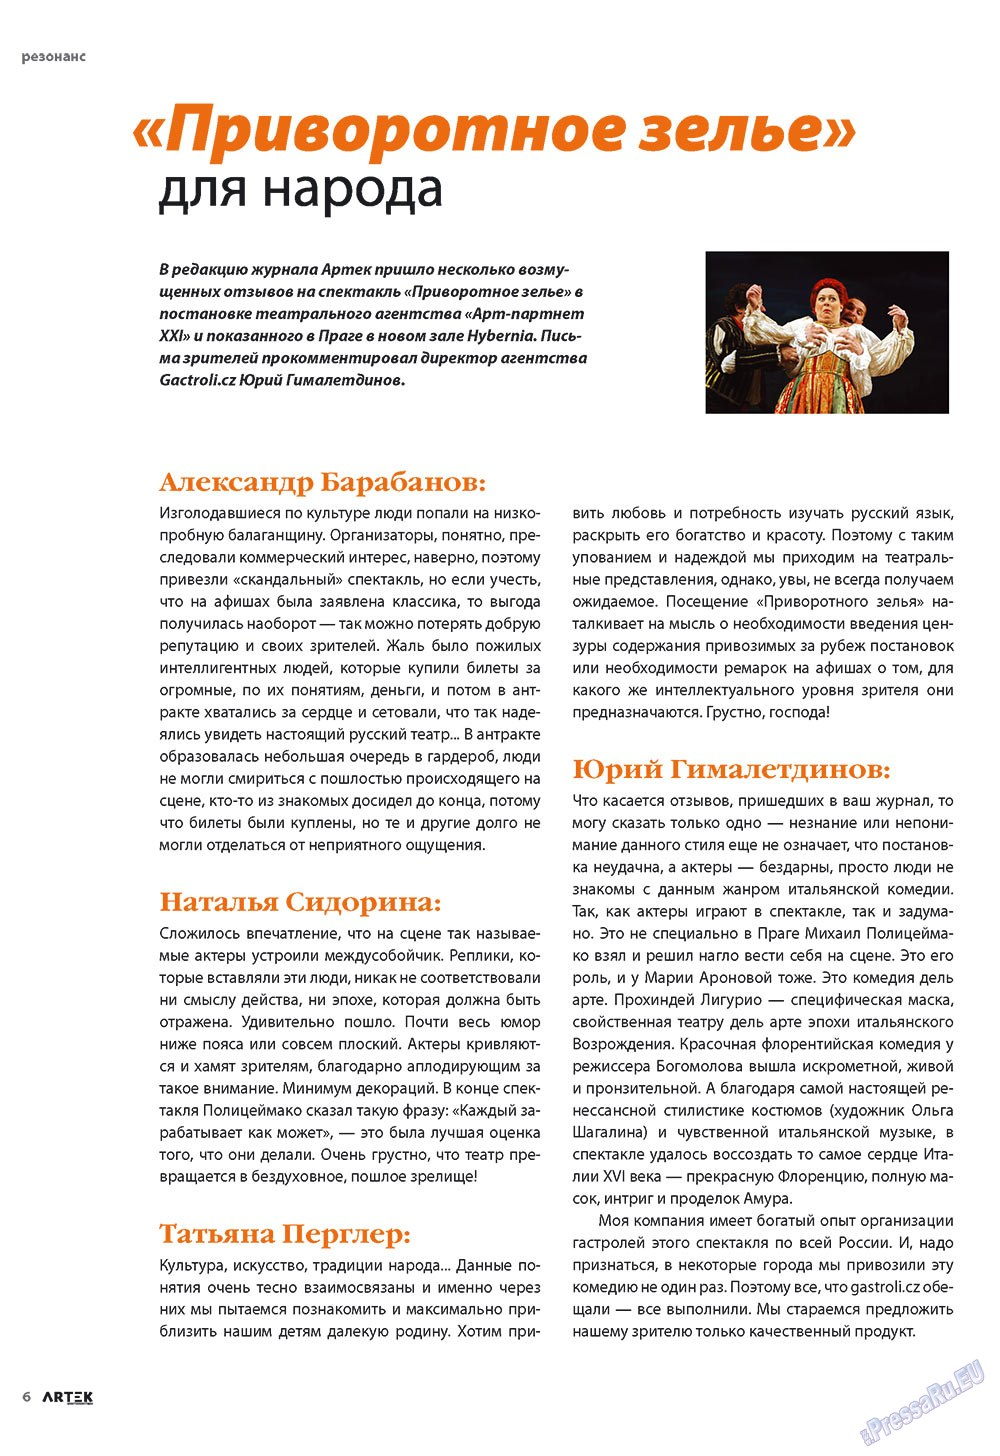 Артек (журнал). 2009 год, номер 5, стр. 6